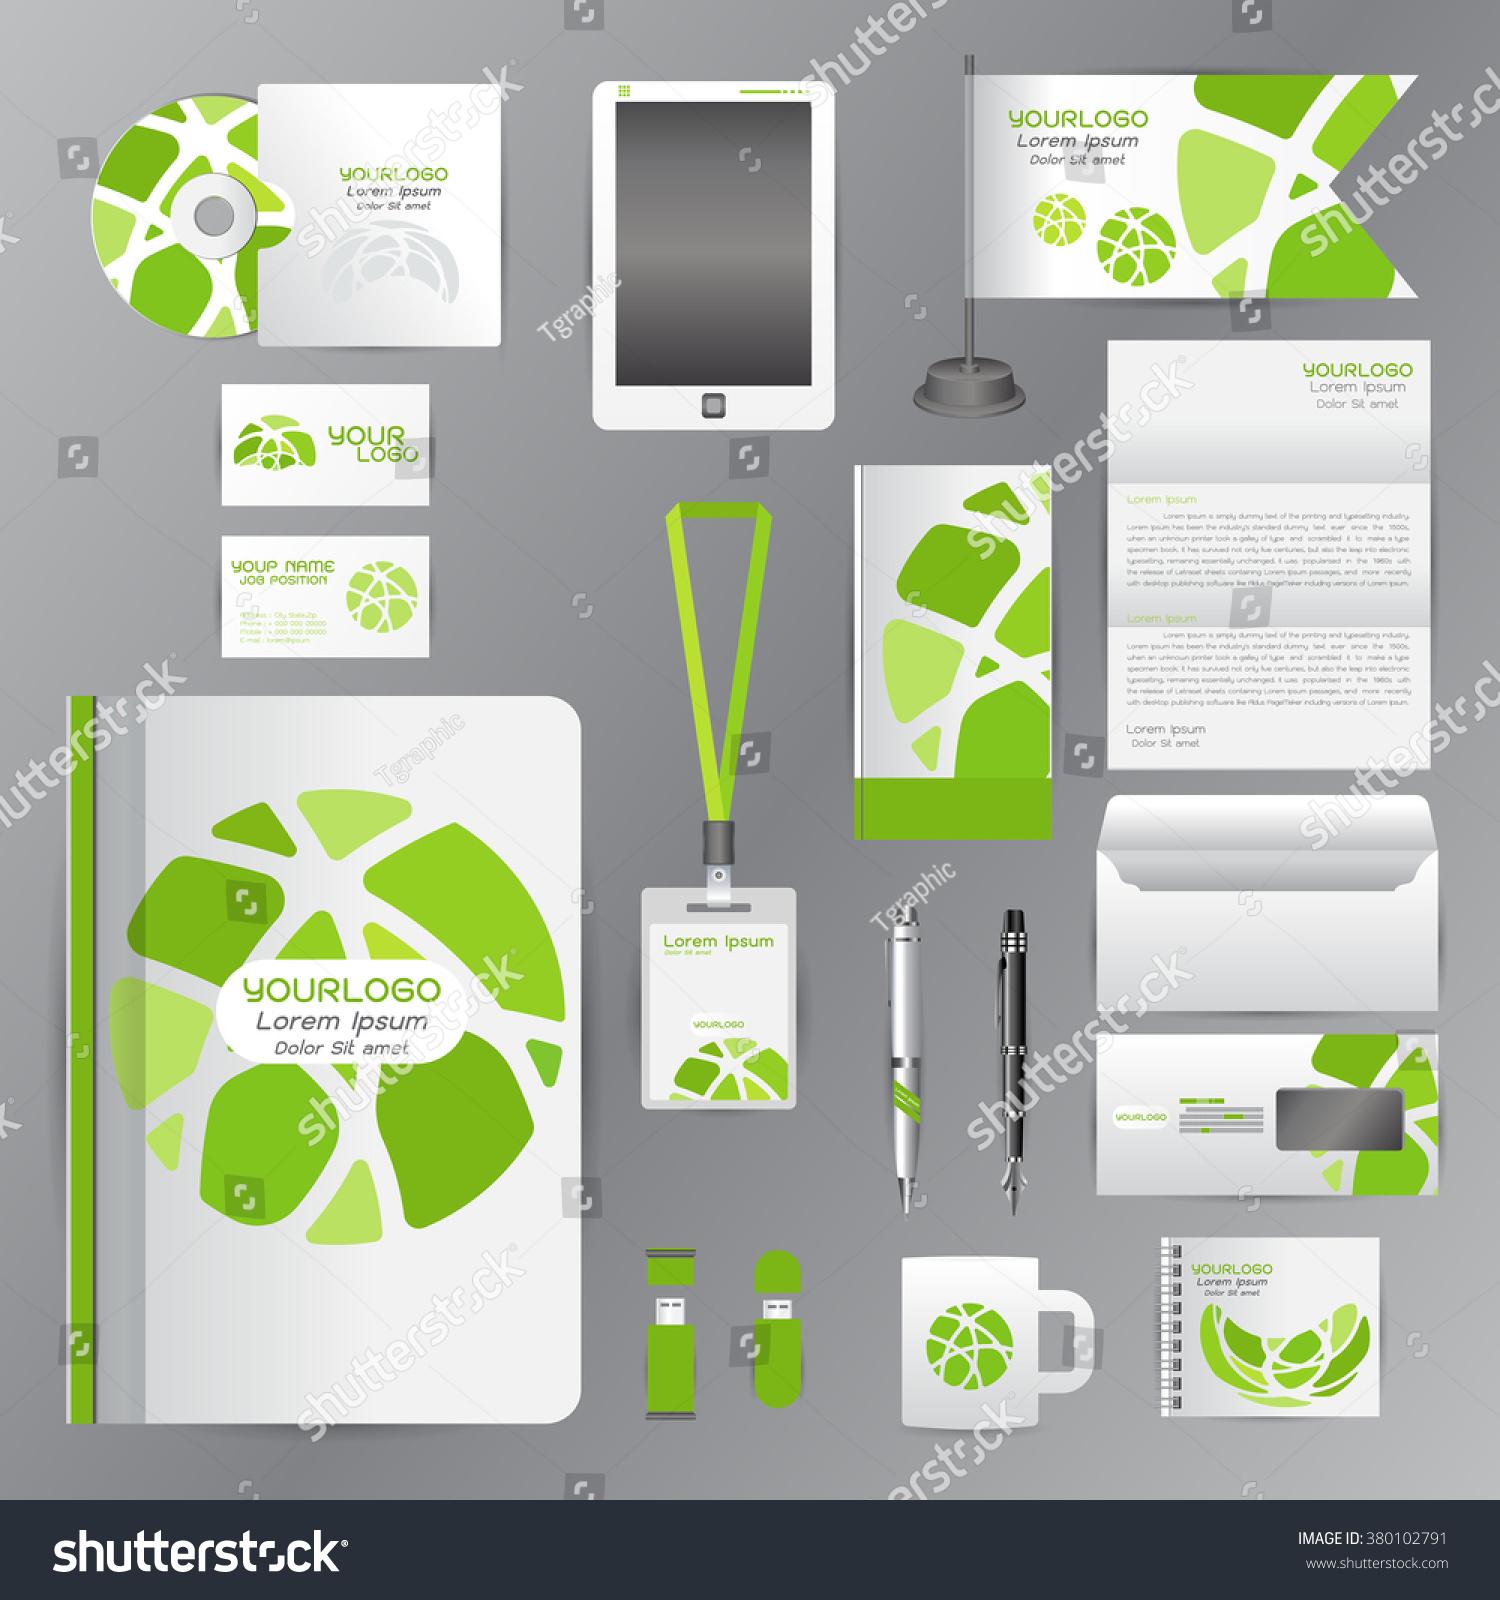 White Identity Template Green Circle Origami Stock Photo (Photo ...